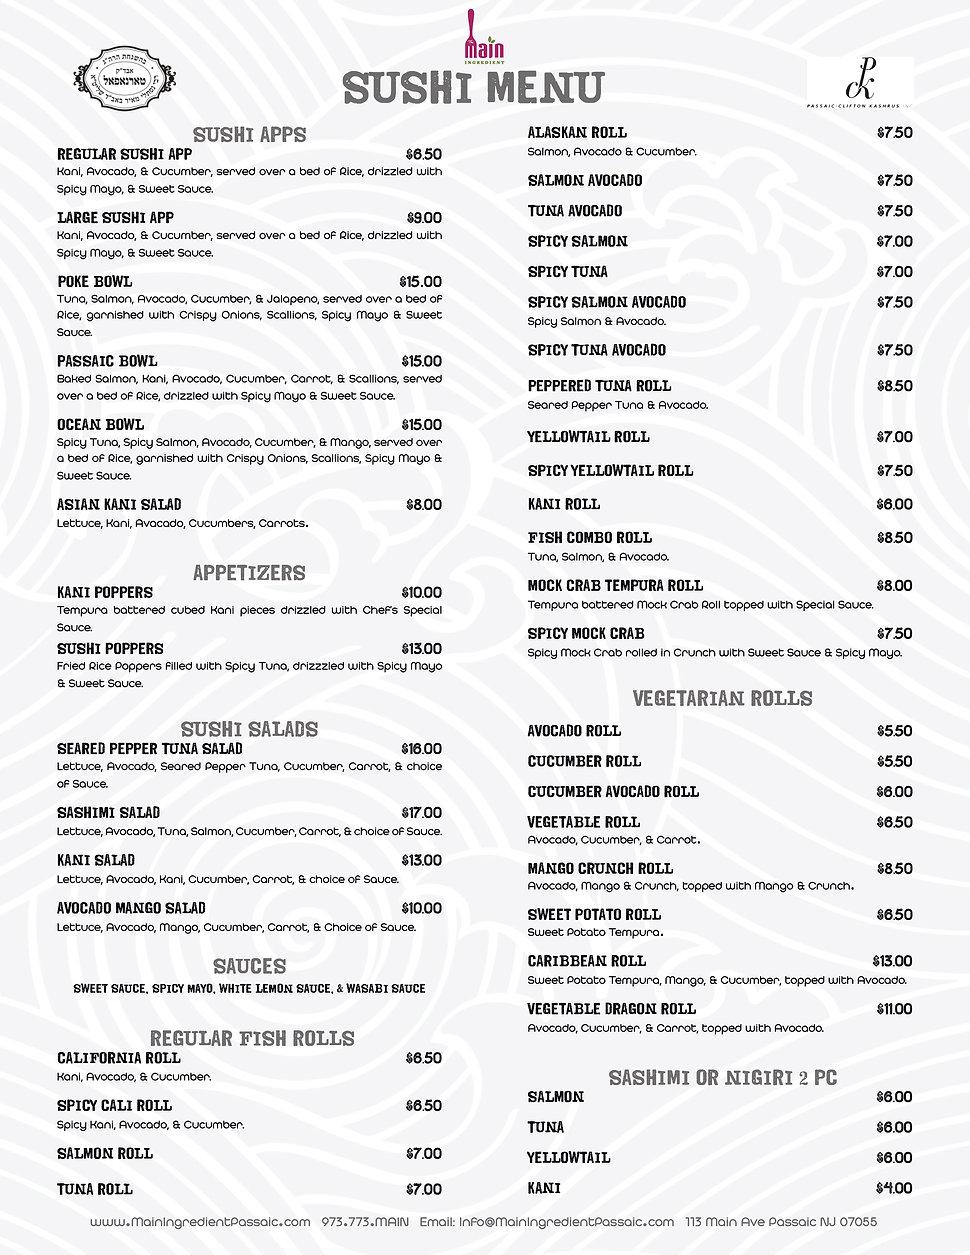 Sushi 2 Page 2.22.20.jpg